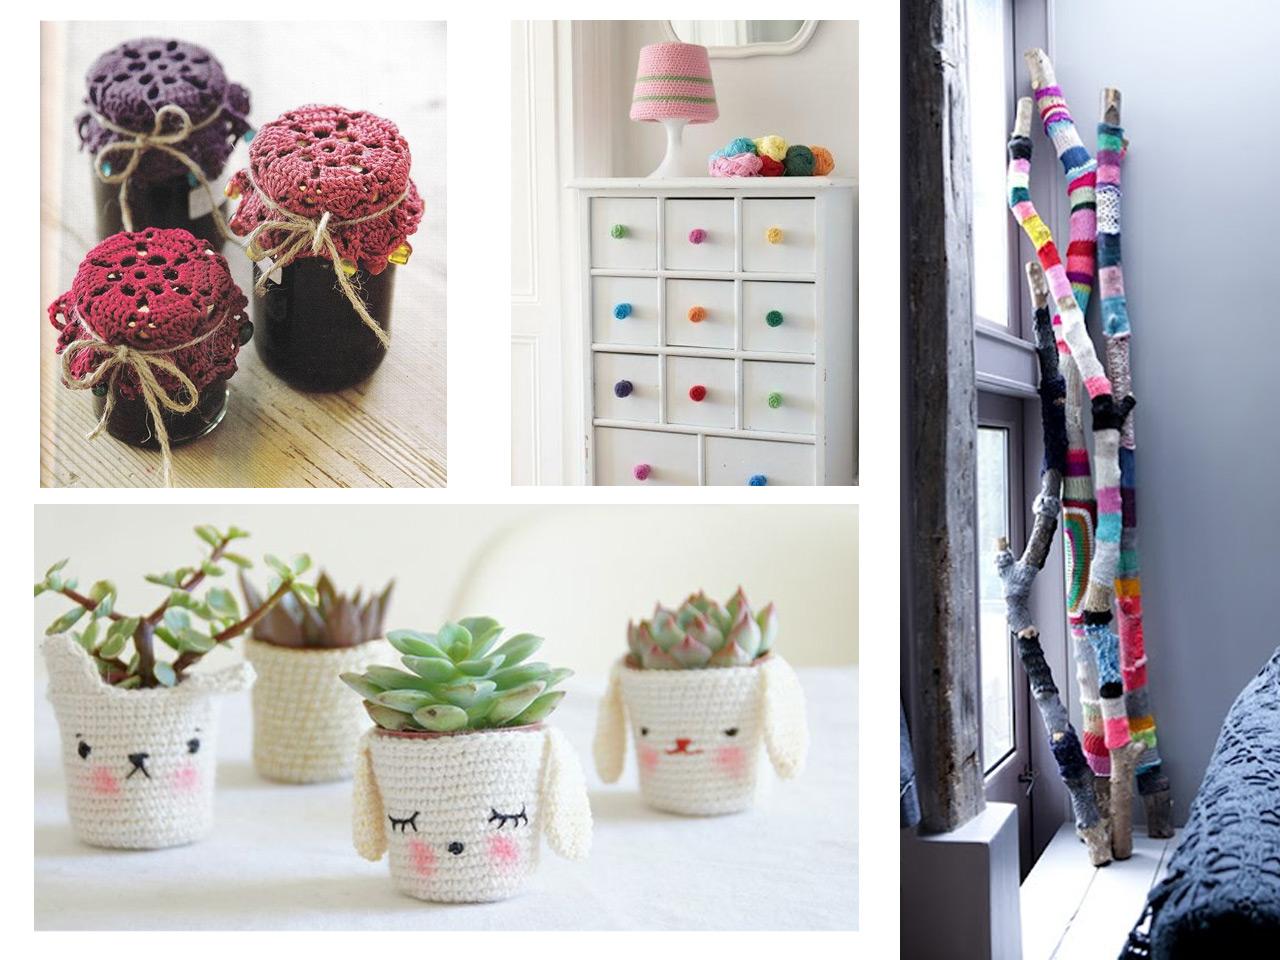 Objetos perfecto para decorar tu hogar casa y dinero for Objetos decoracion hogar